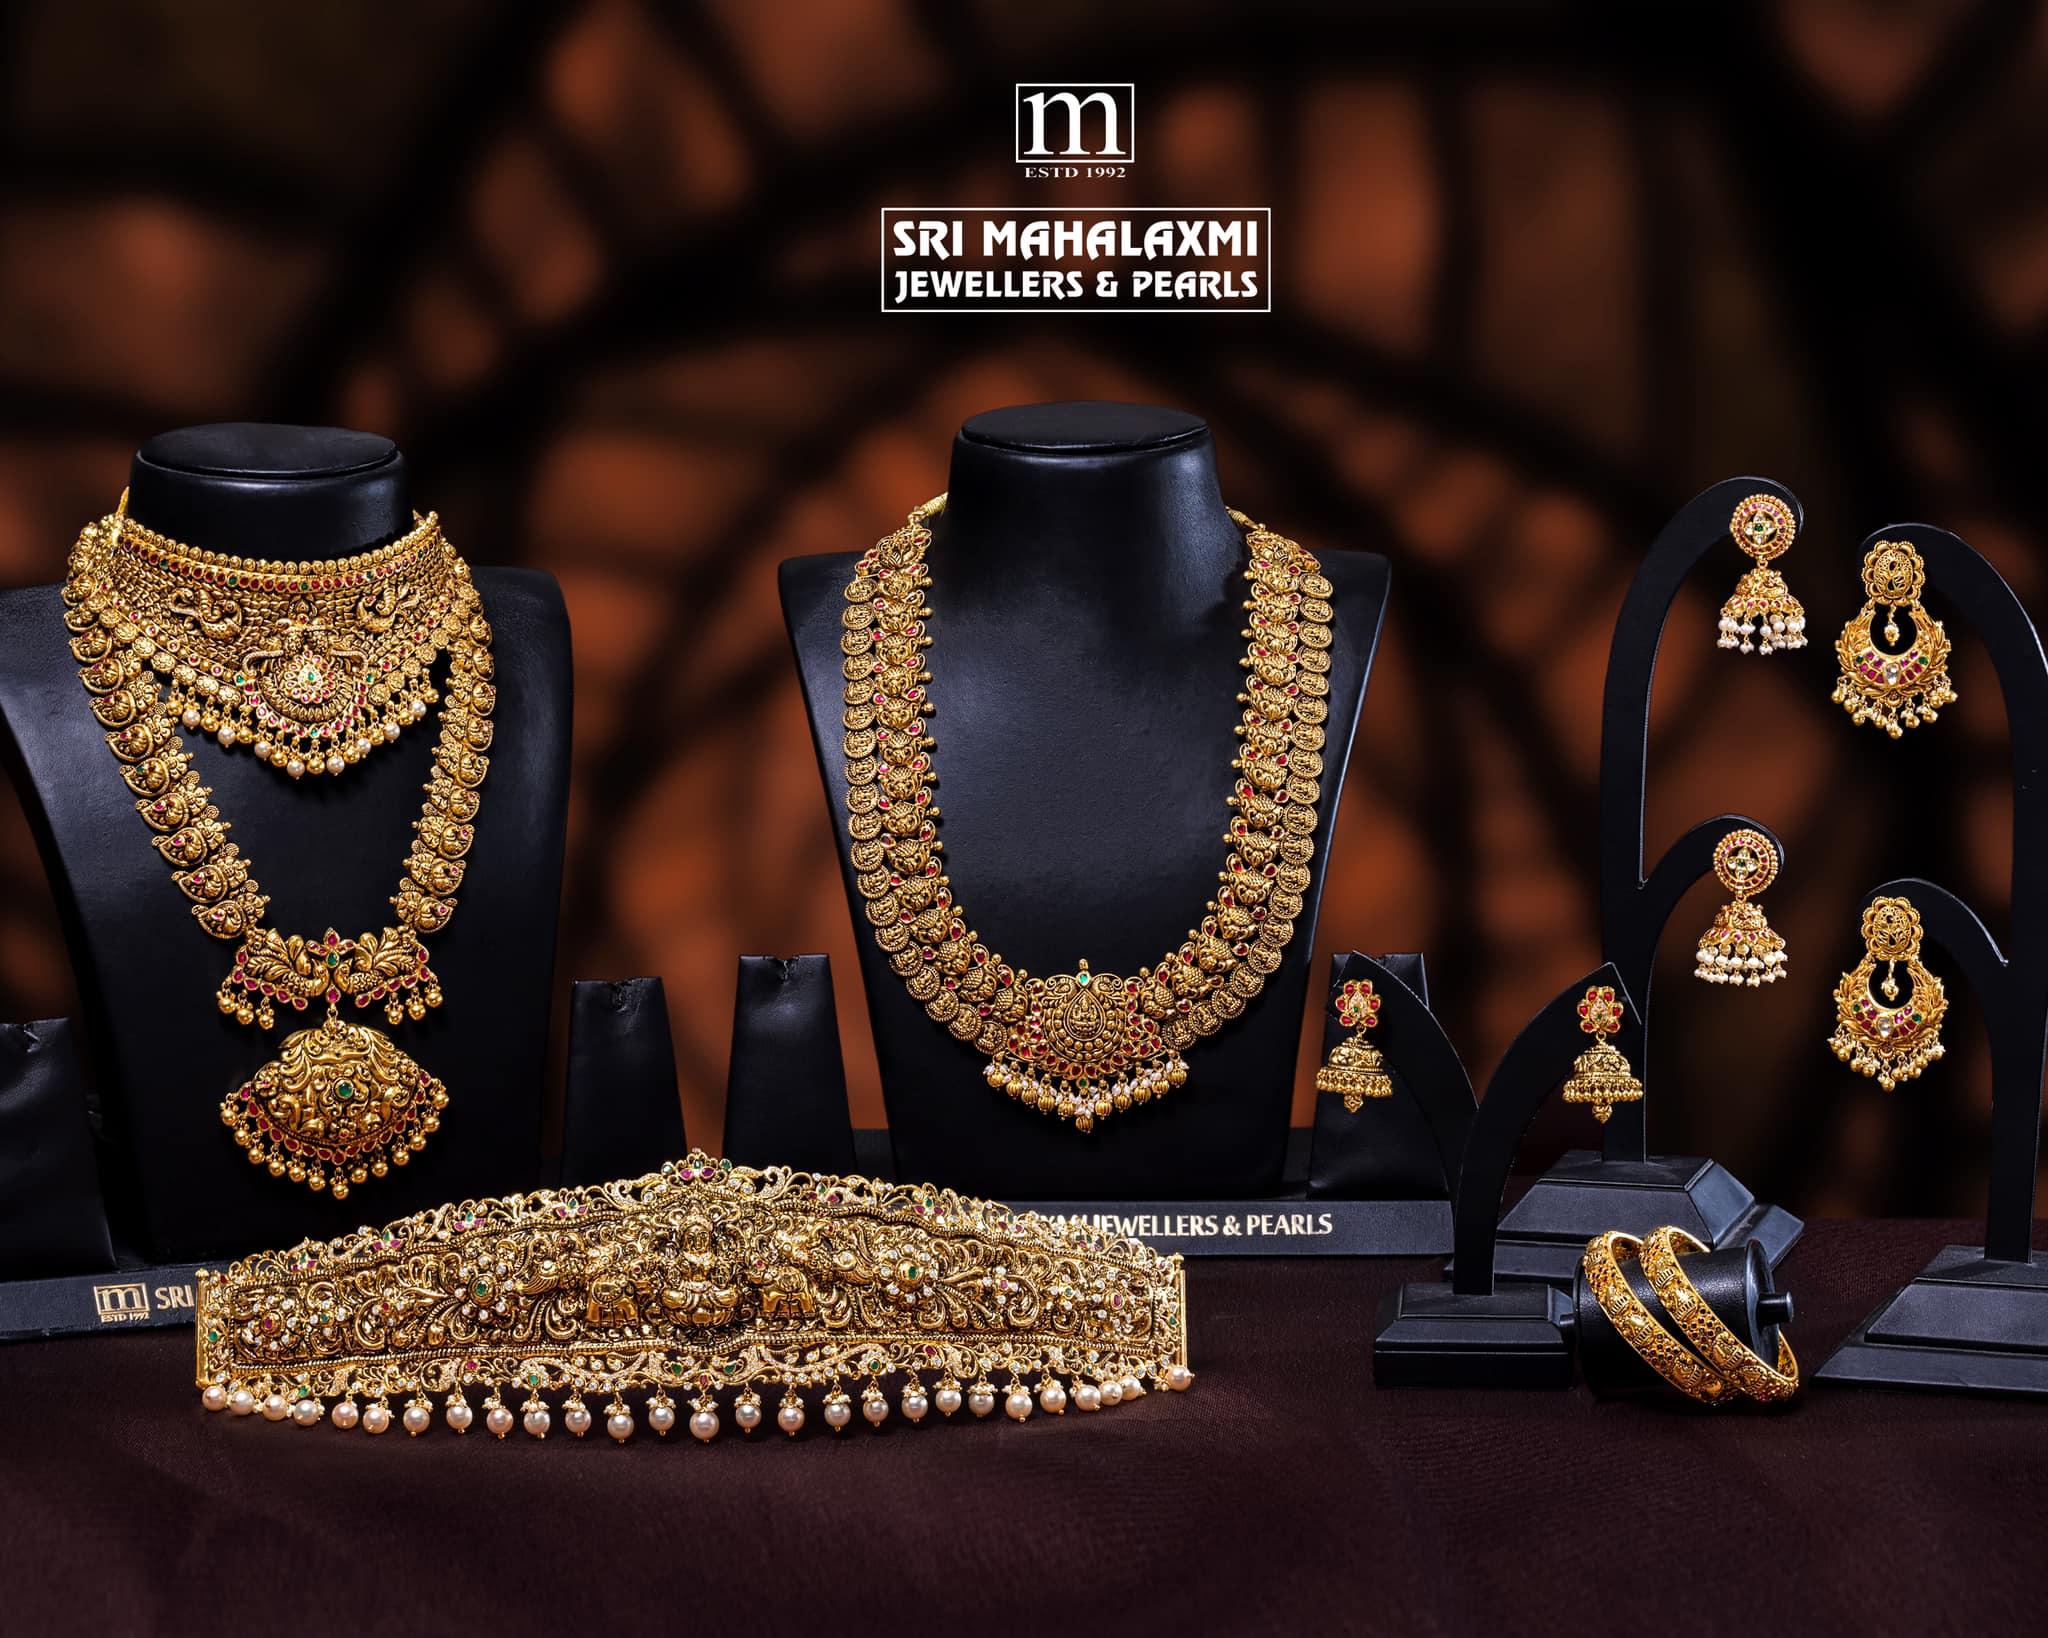 Beautiful 22k gold bridal set from Sri Mahalaxmi Jewellers  Pearls. 2021-01-04